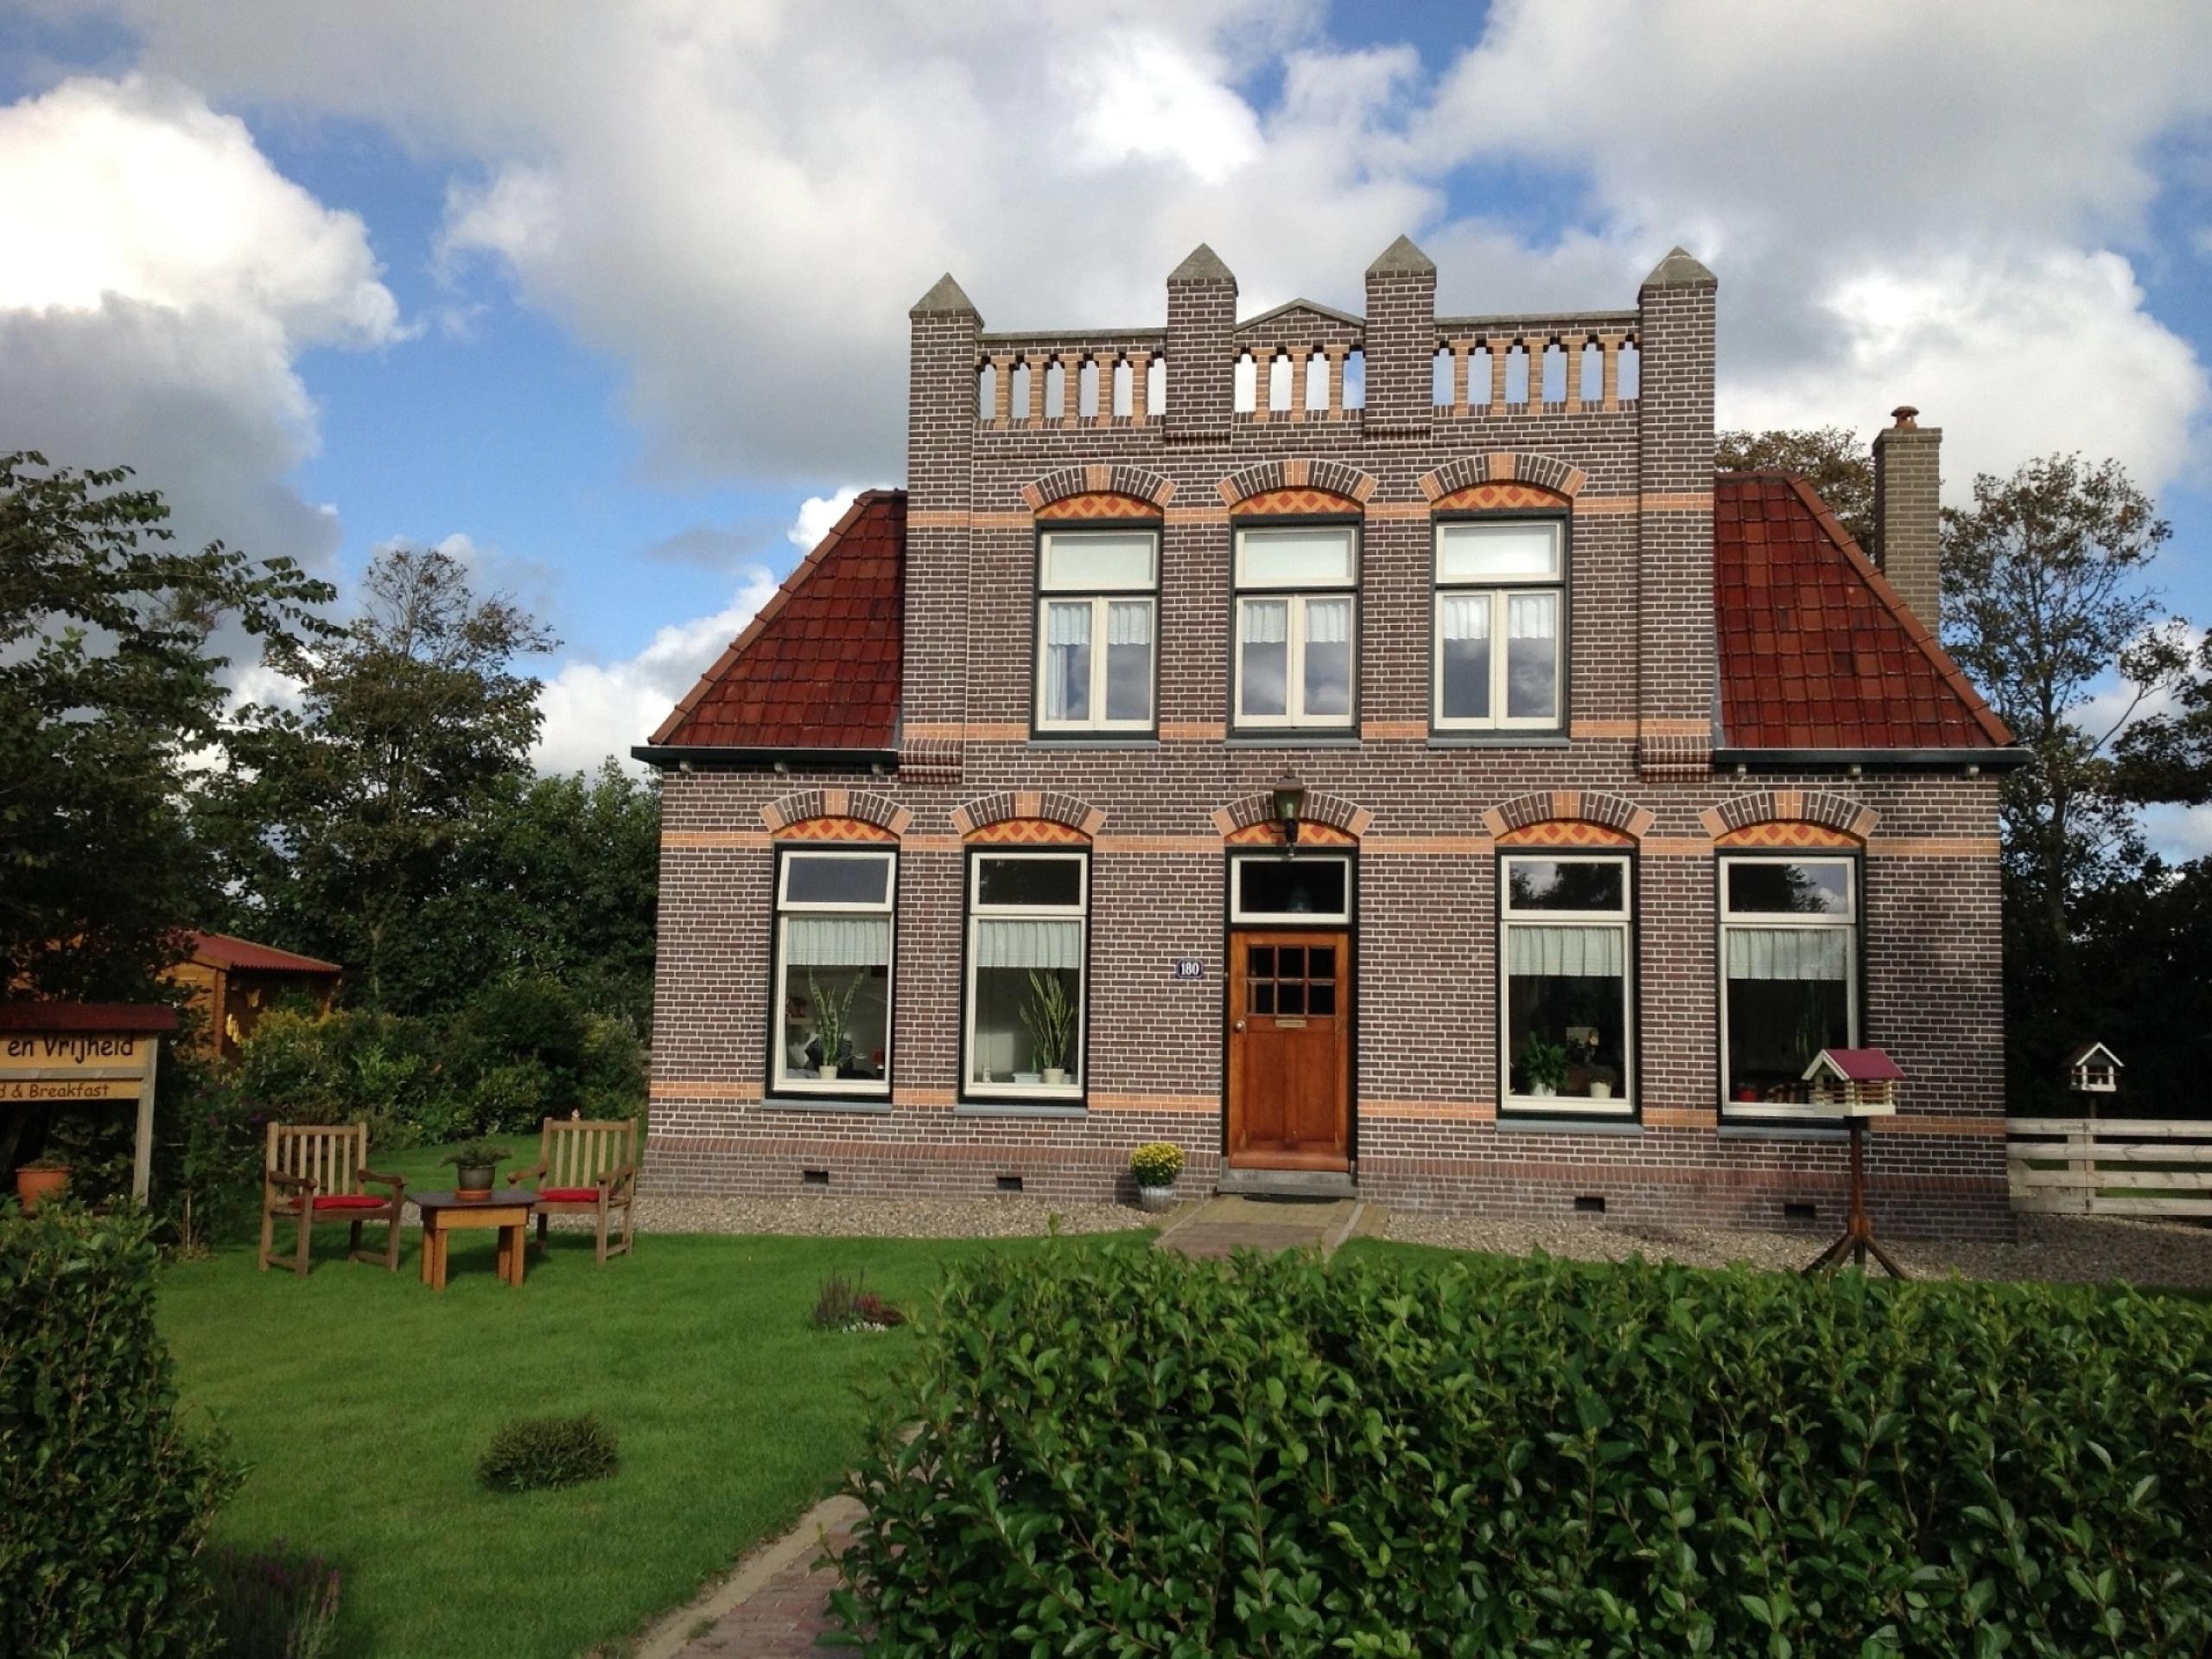 Enjoy this authentic rural accommodation near De Koog